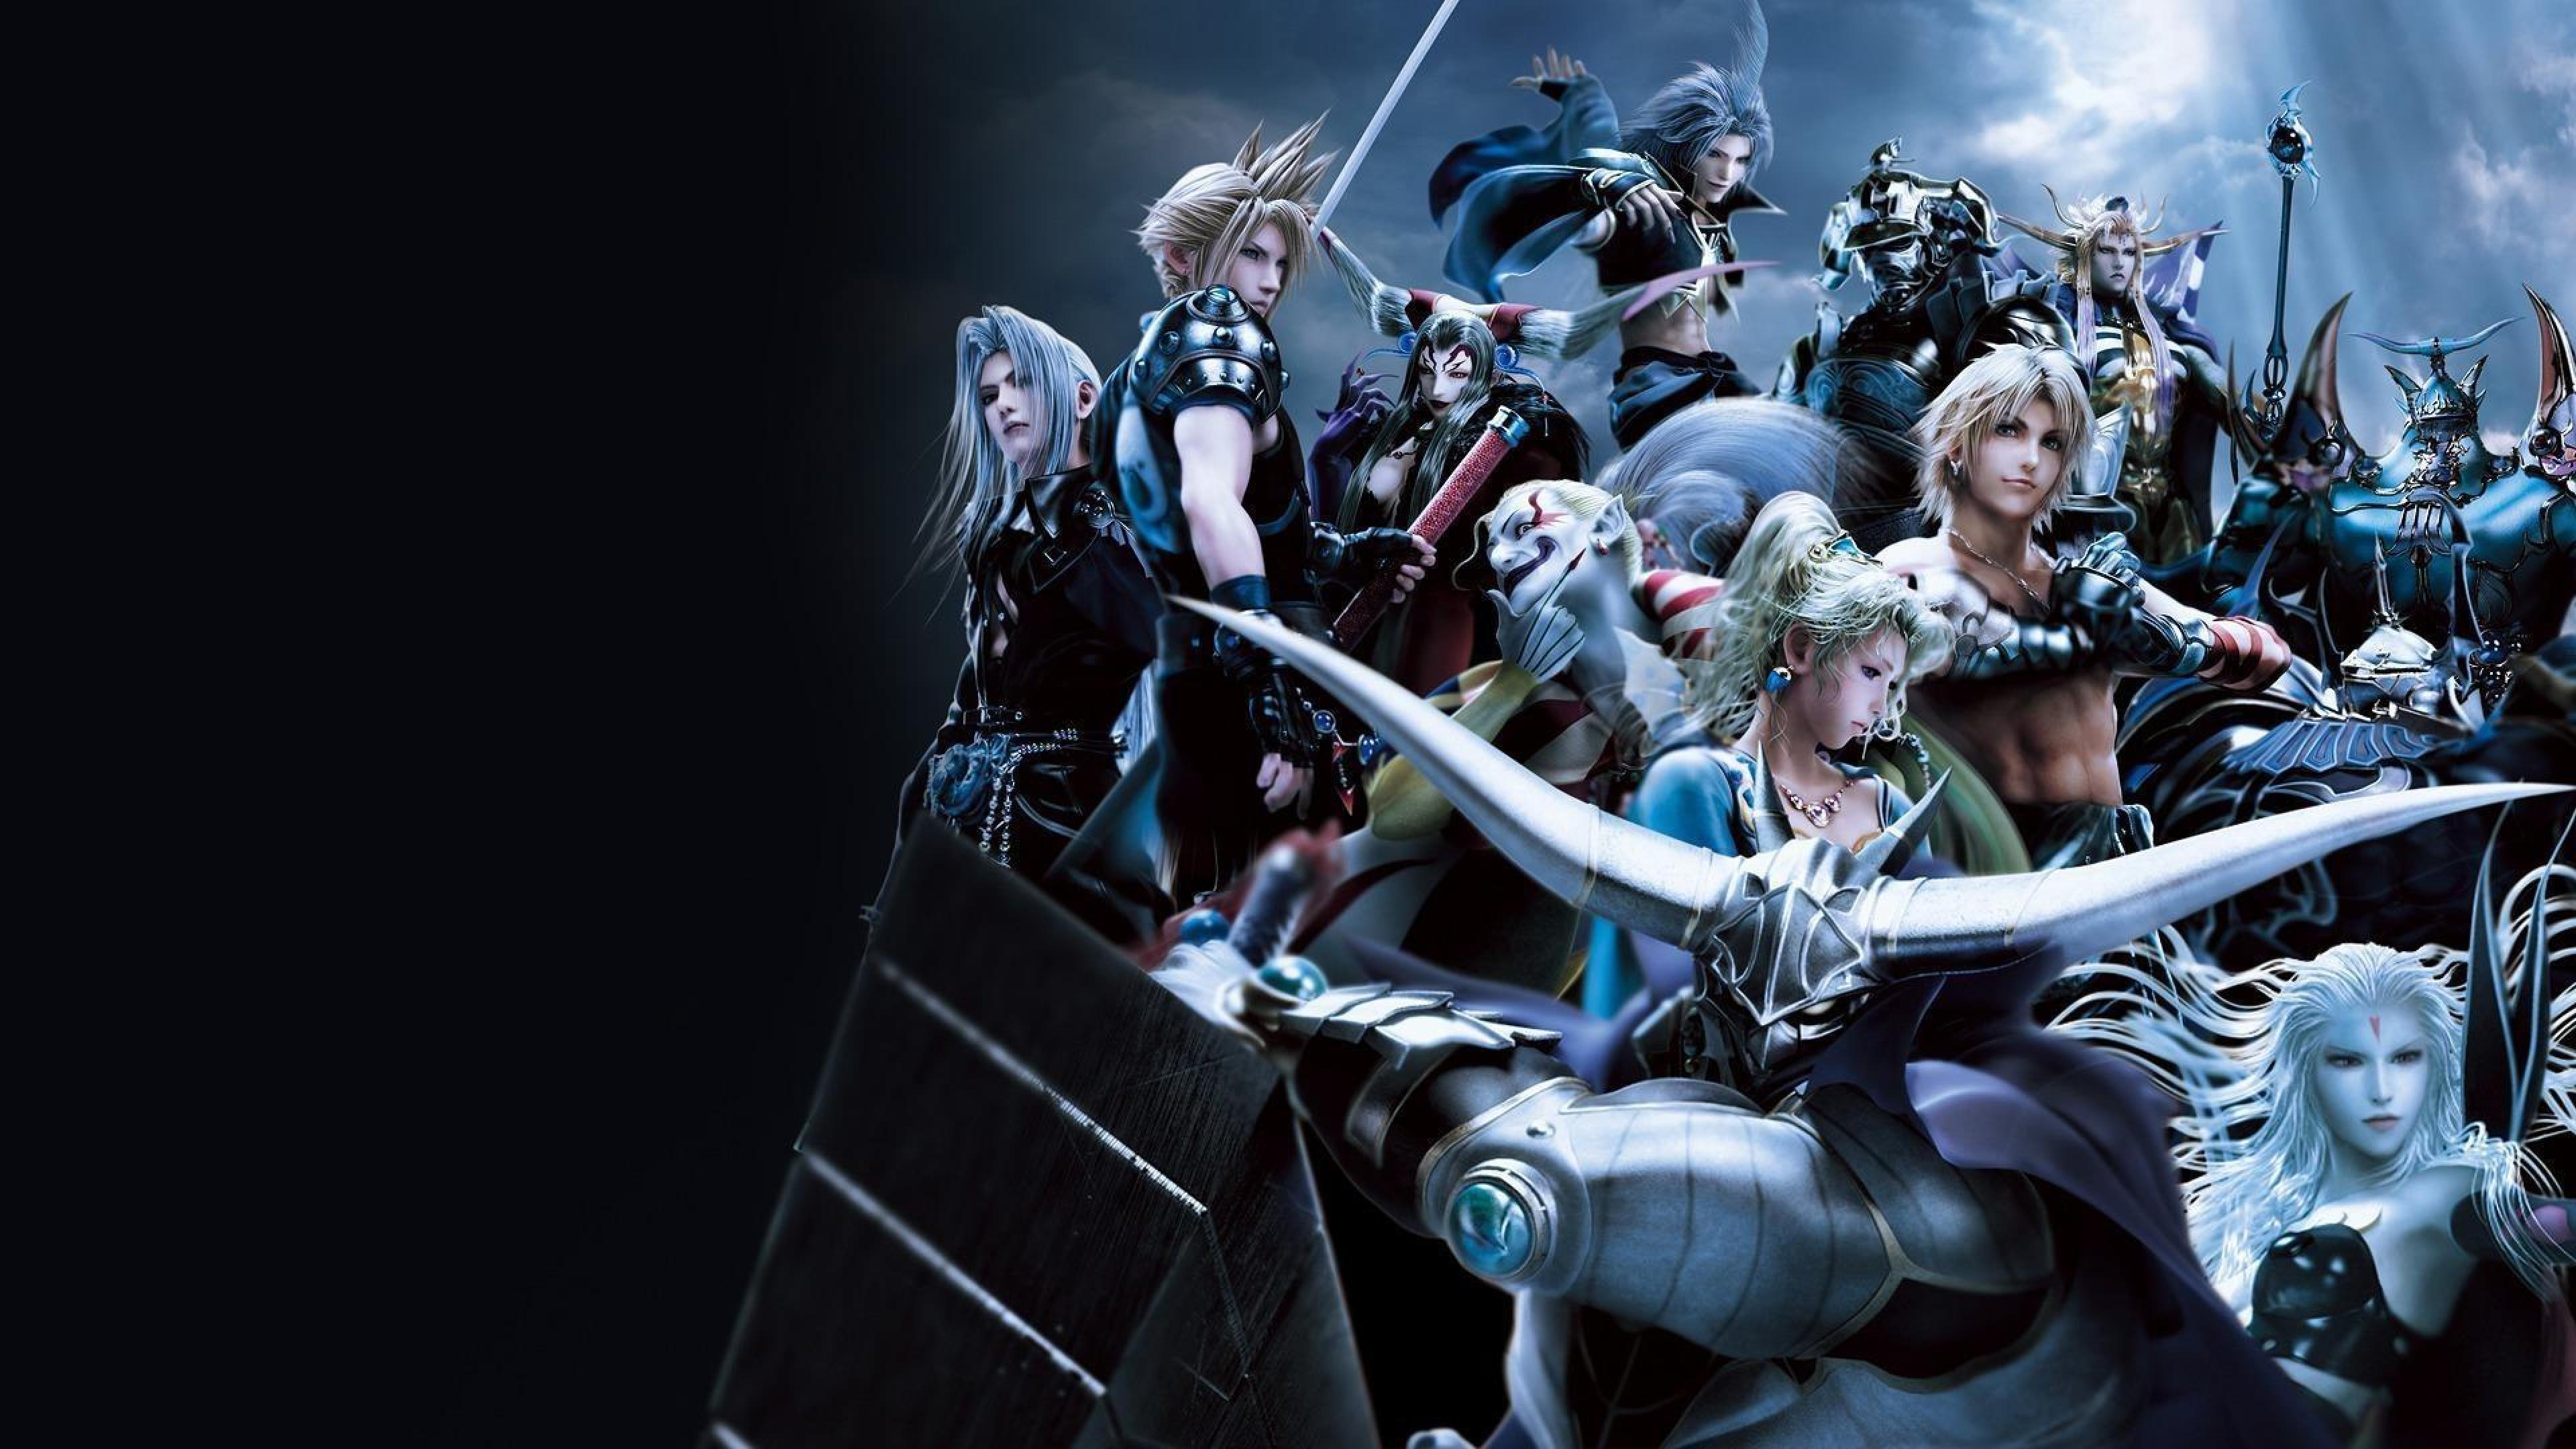 Final fantasy HD Wallpapers Desktop Backgrounds Mobile 3840x2160